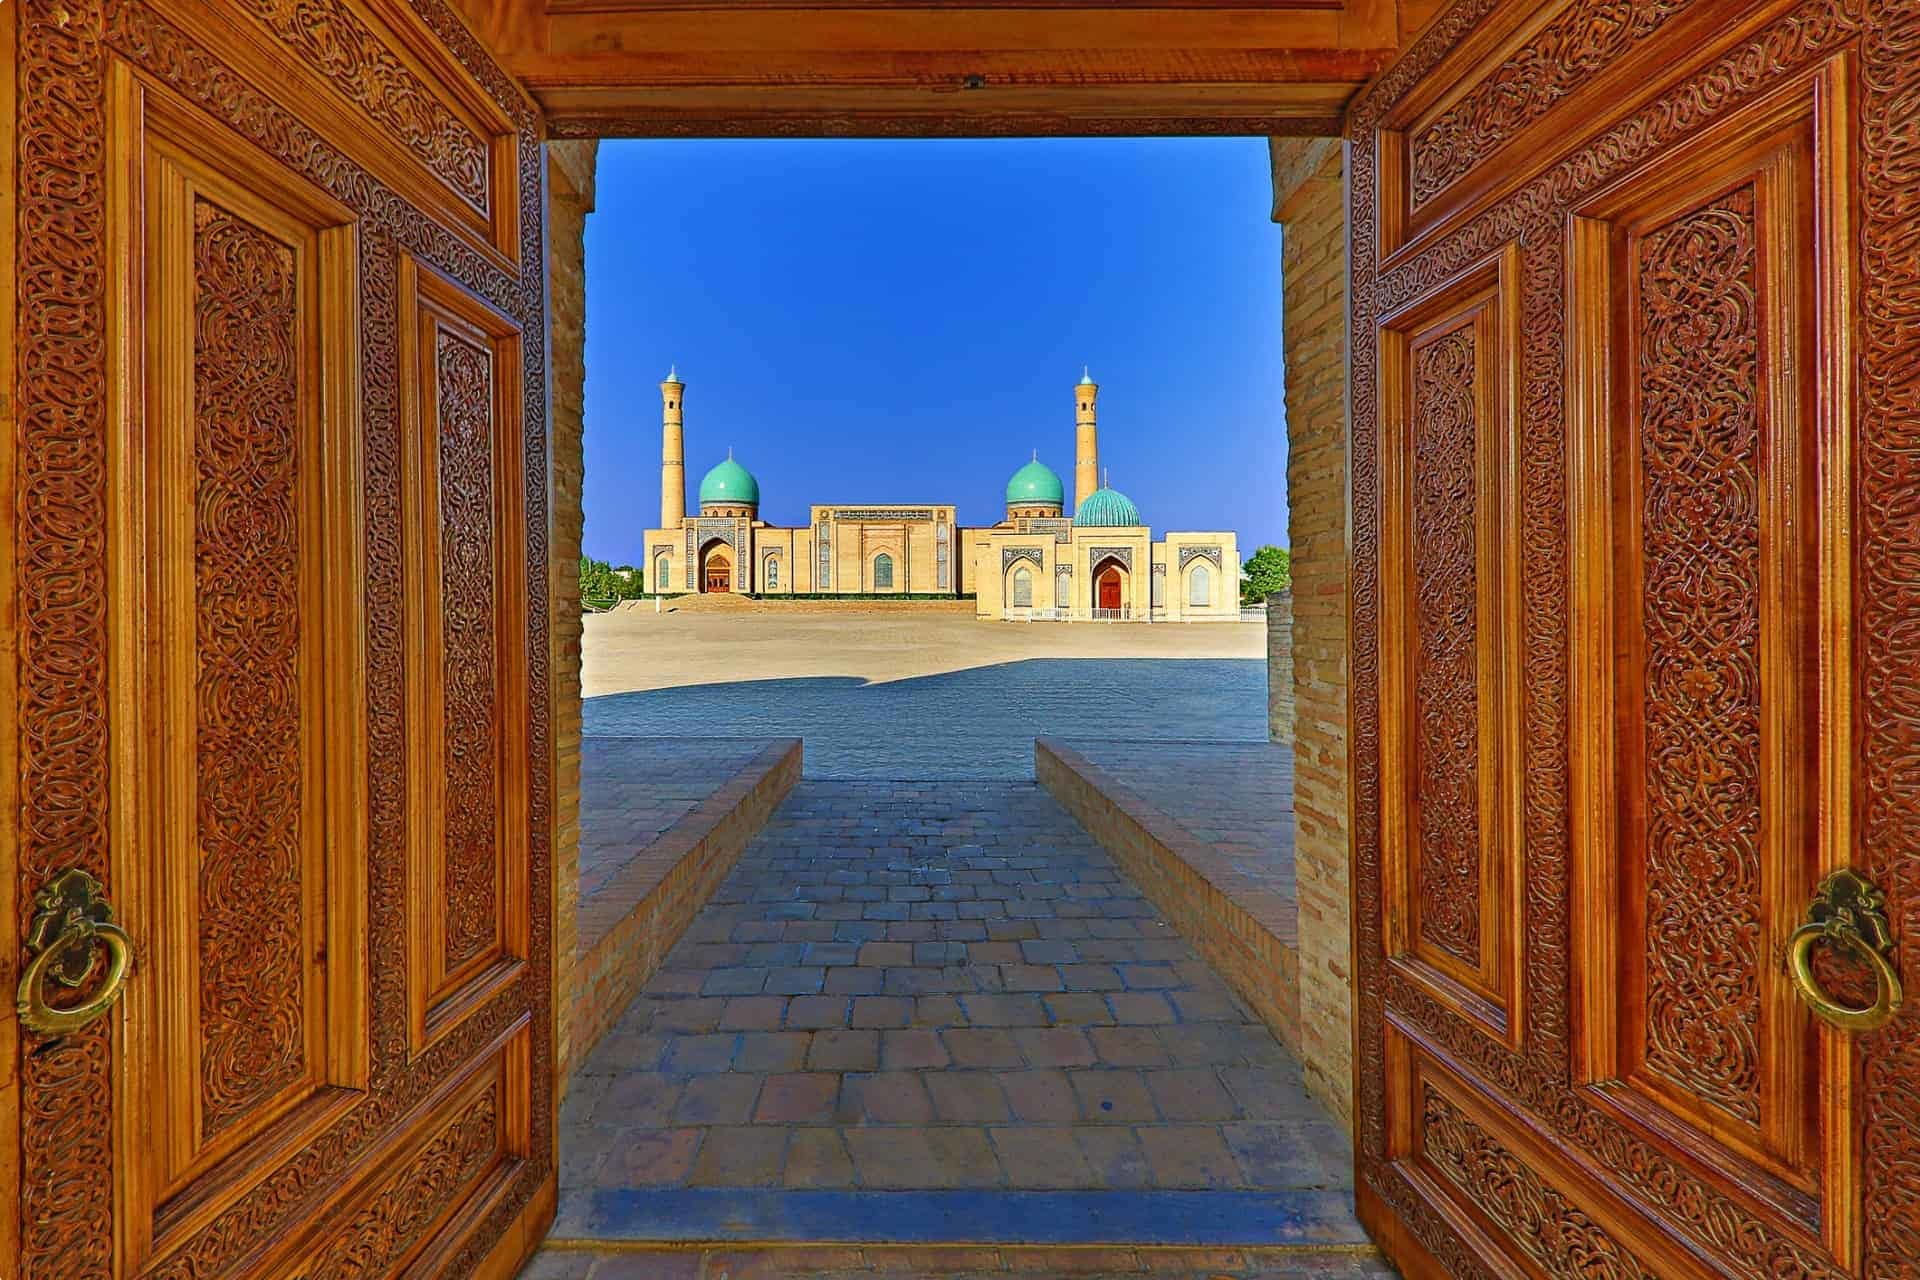 Khast Imam Mosque Tashkent